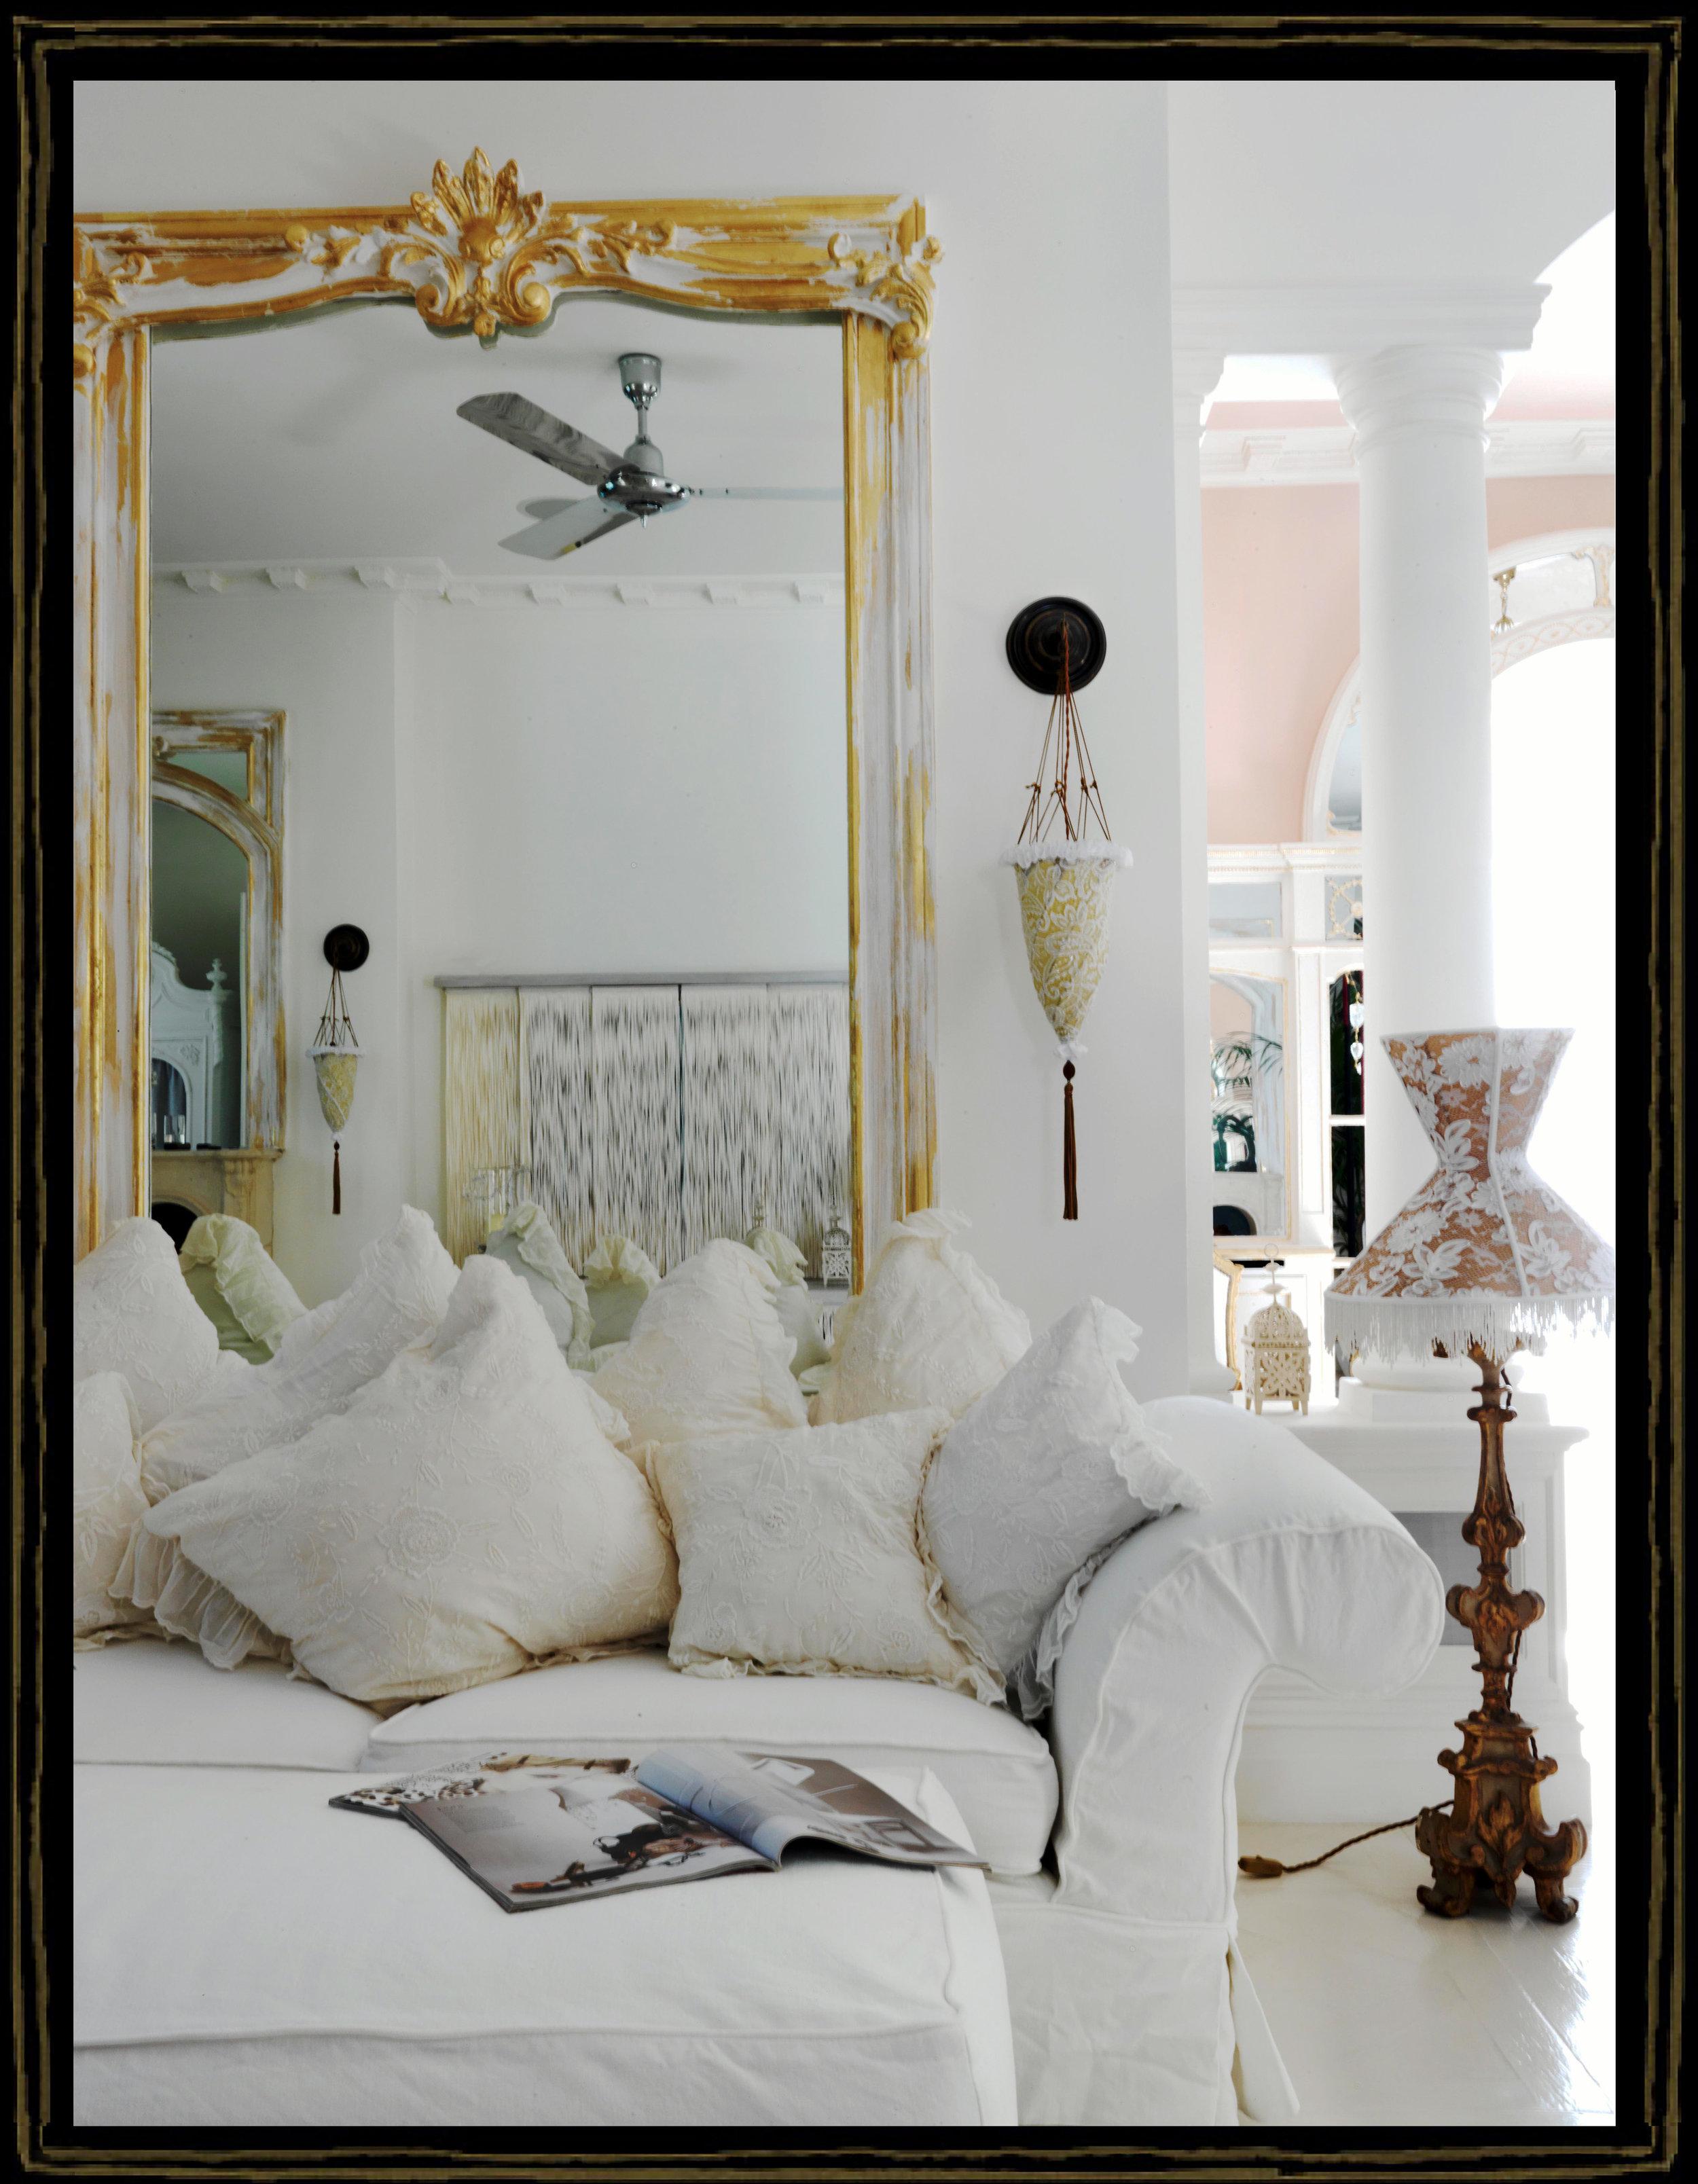 salon abg_k4564d67bf63_1000038.jpg